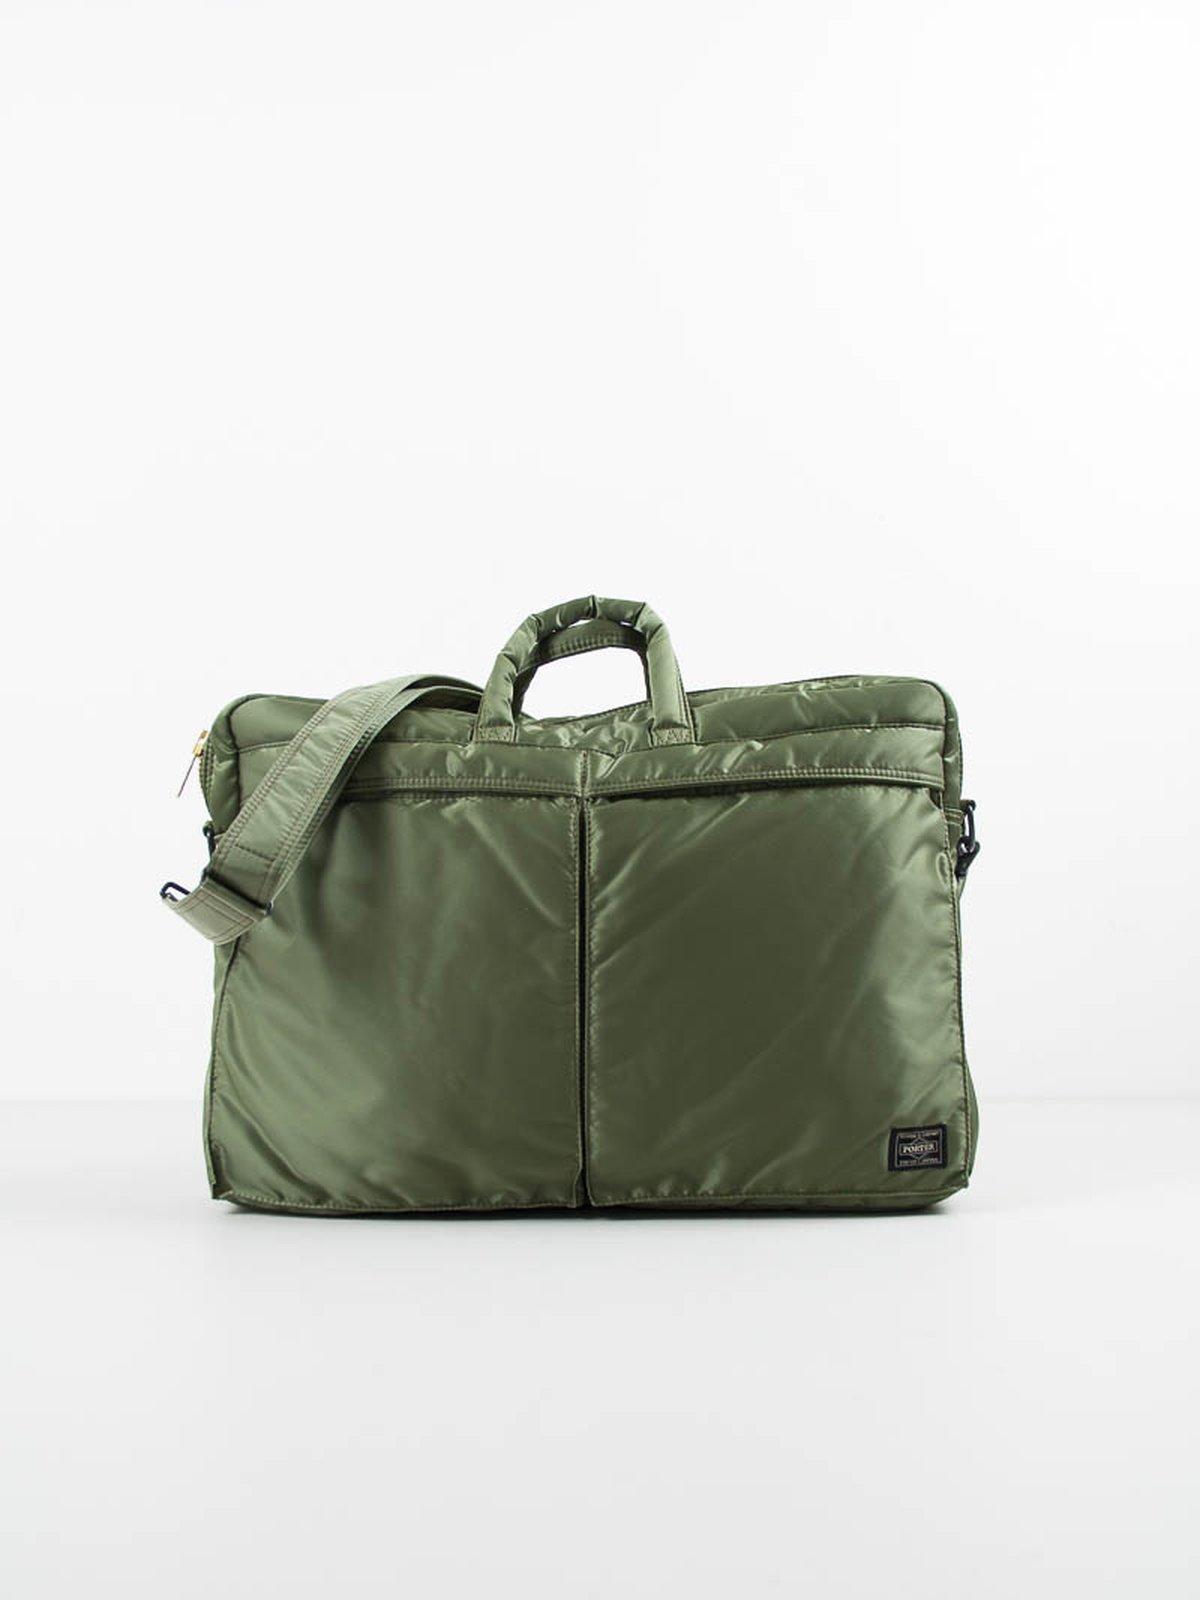 541603bf91 Khaki Green Tanker Brief Case by Porter – Yoshida   Co Ltd – The ...